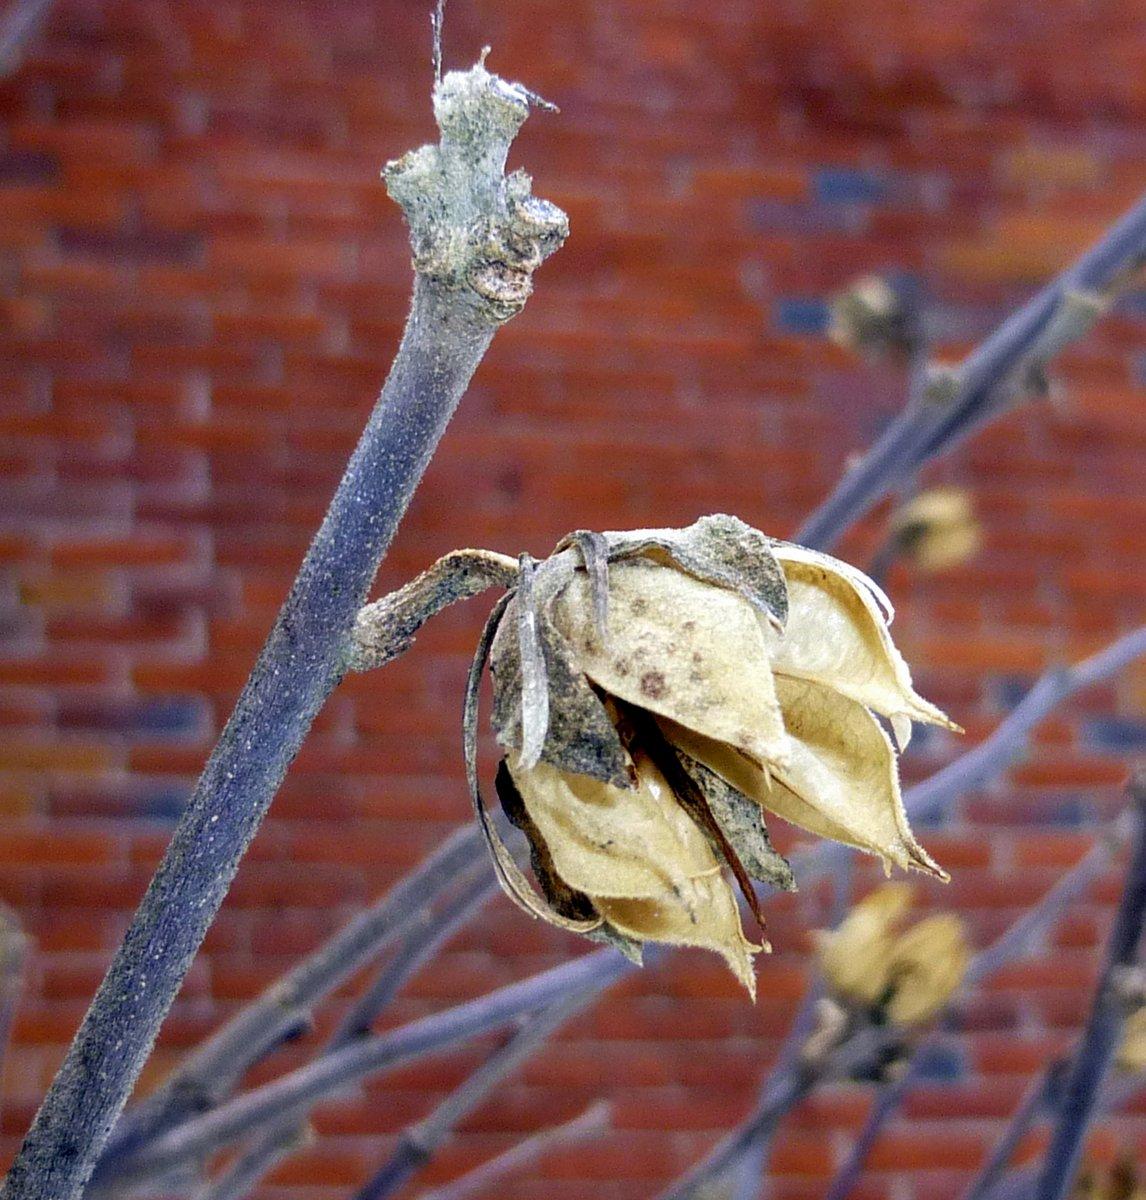 12. Rose of Sharon Seed Pod